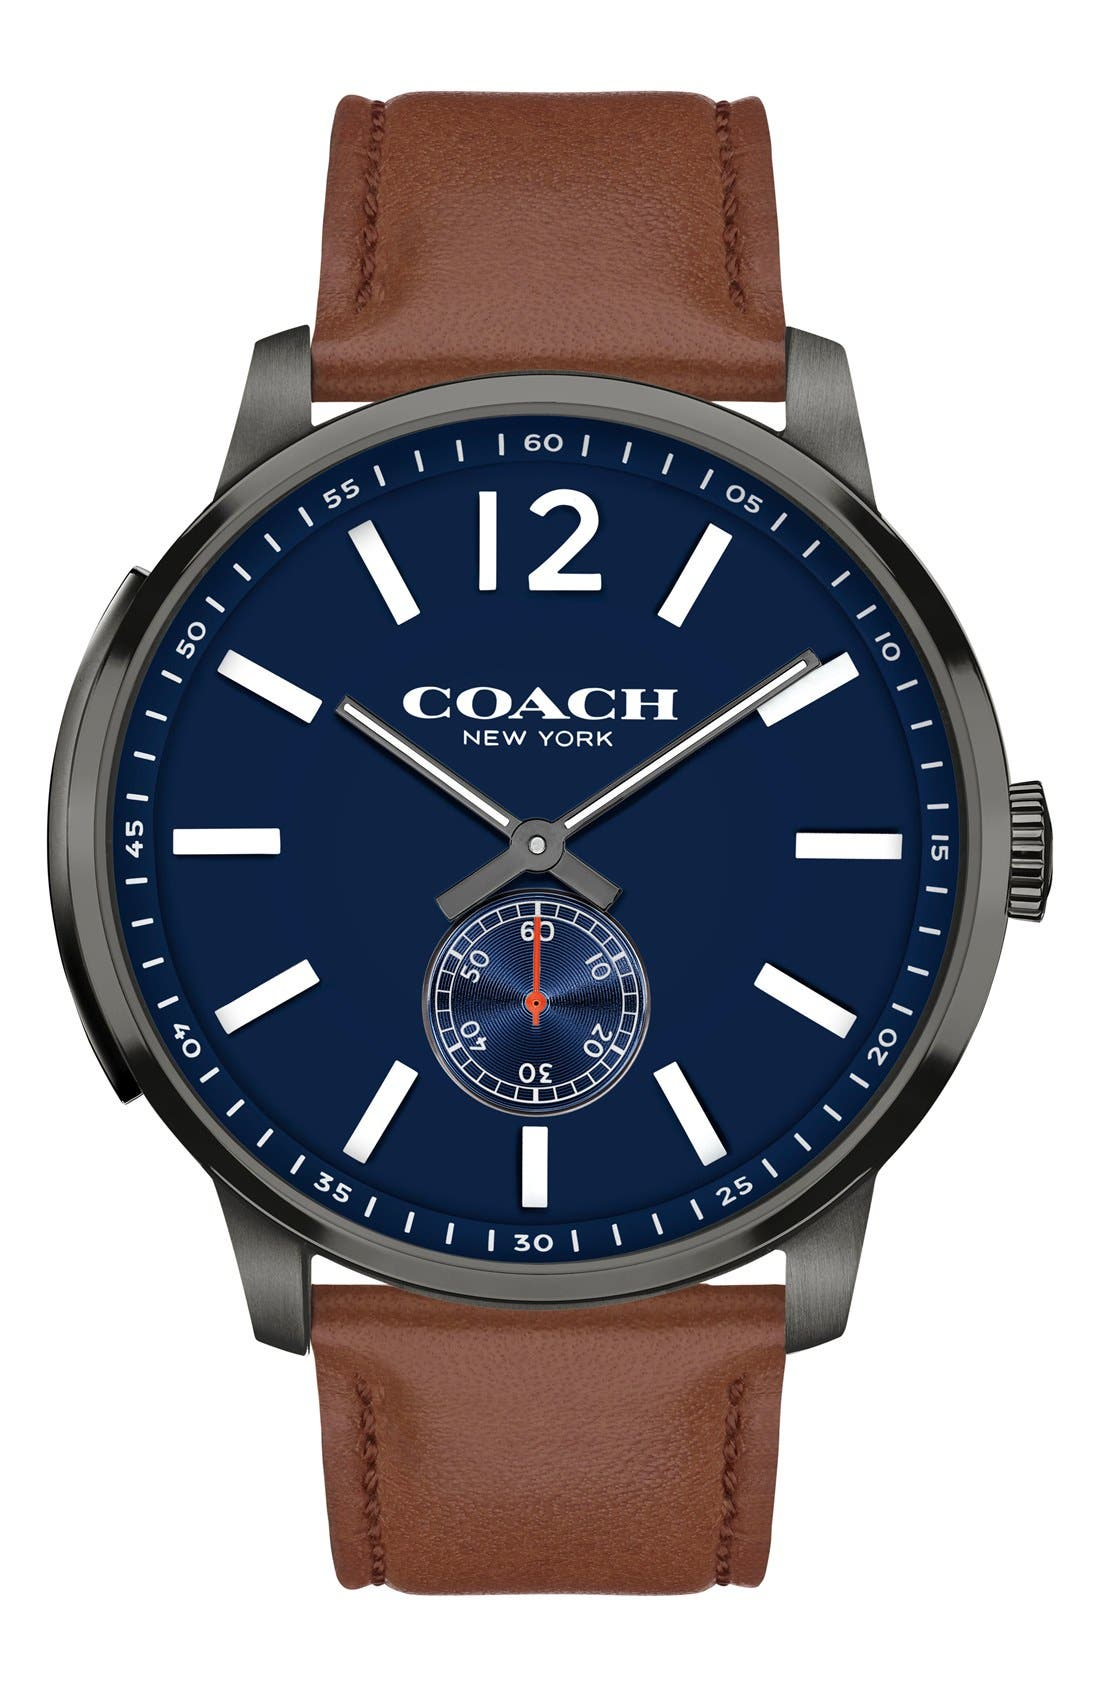 COACH 'Bleeker' Leather Strap Watch, 46mm